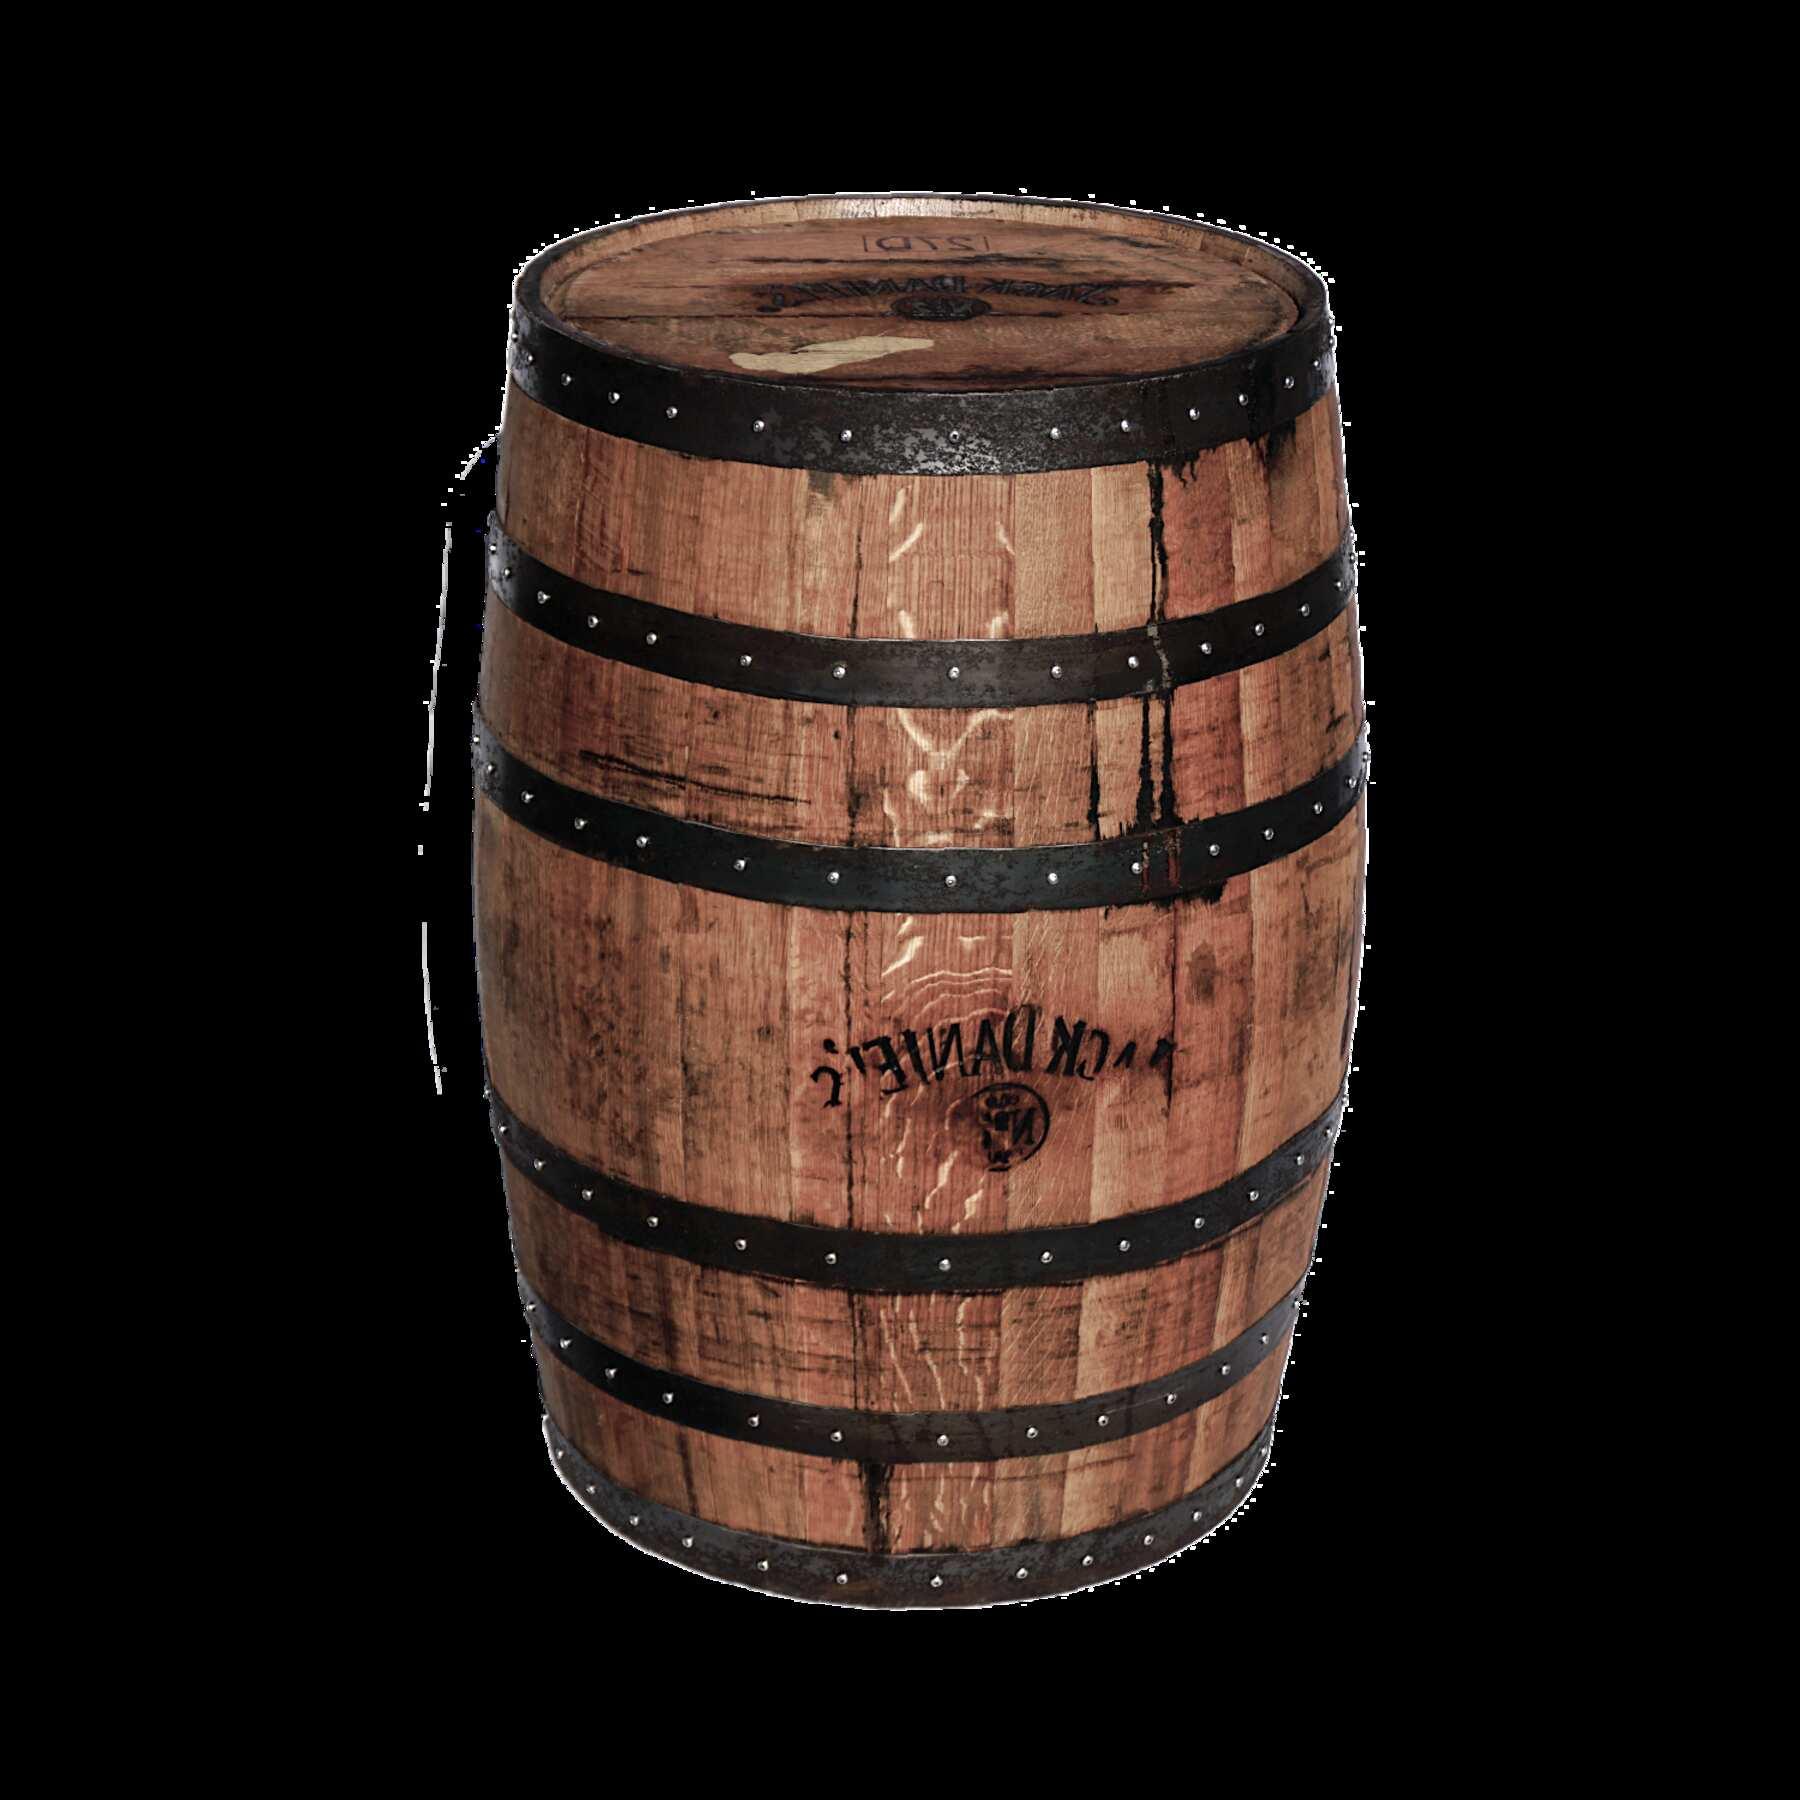 jack daniels barrel for sale